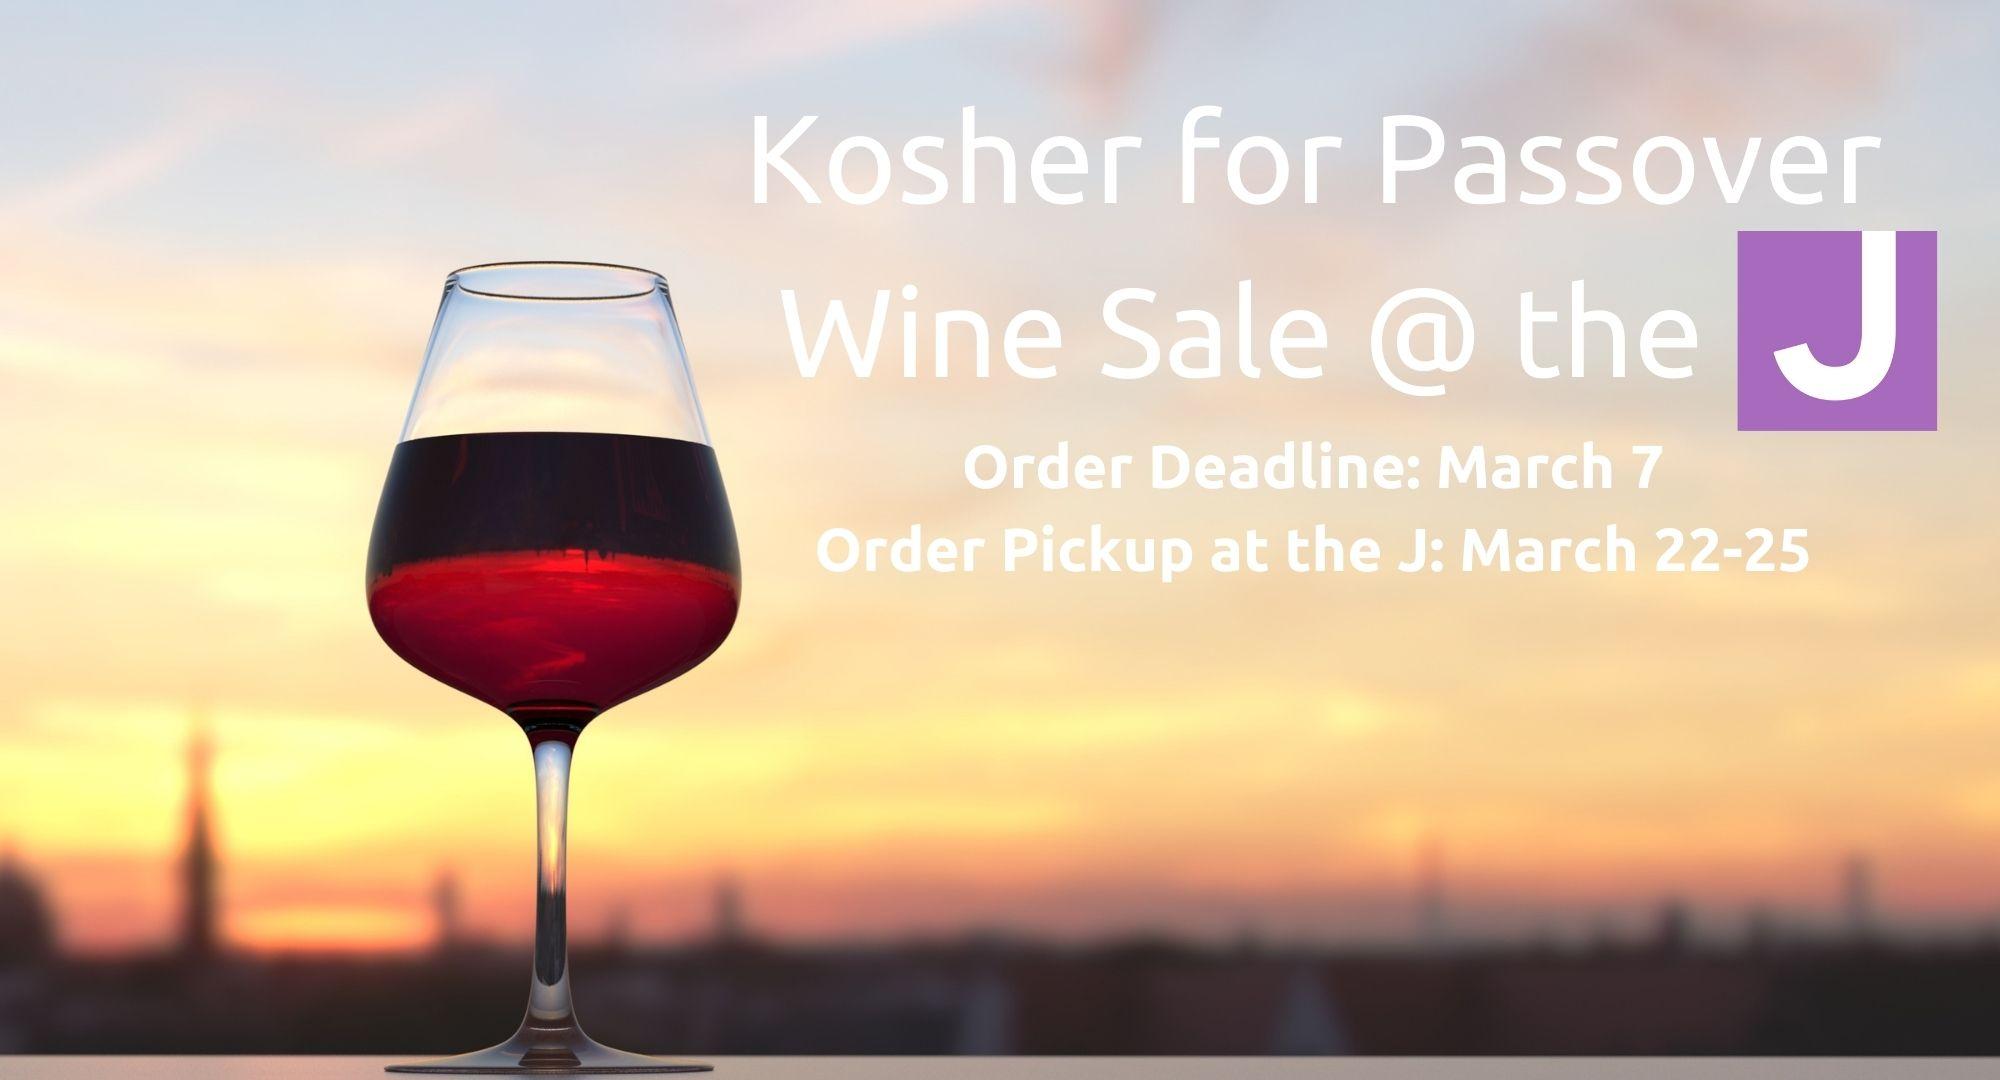 Kosher for Passover Wine Sale